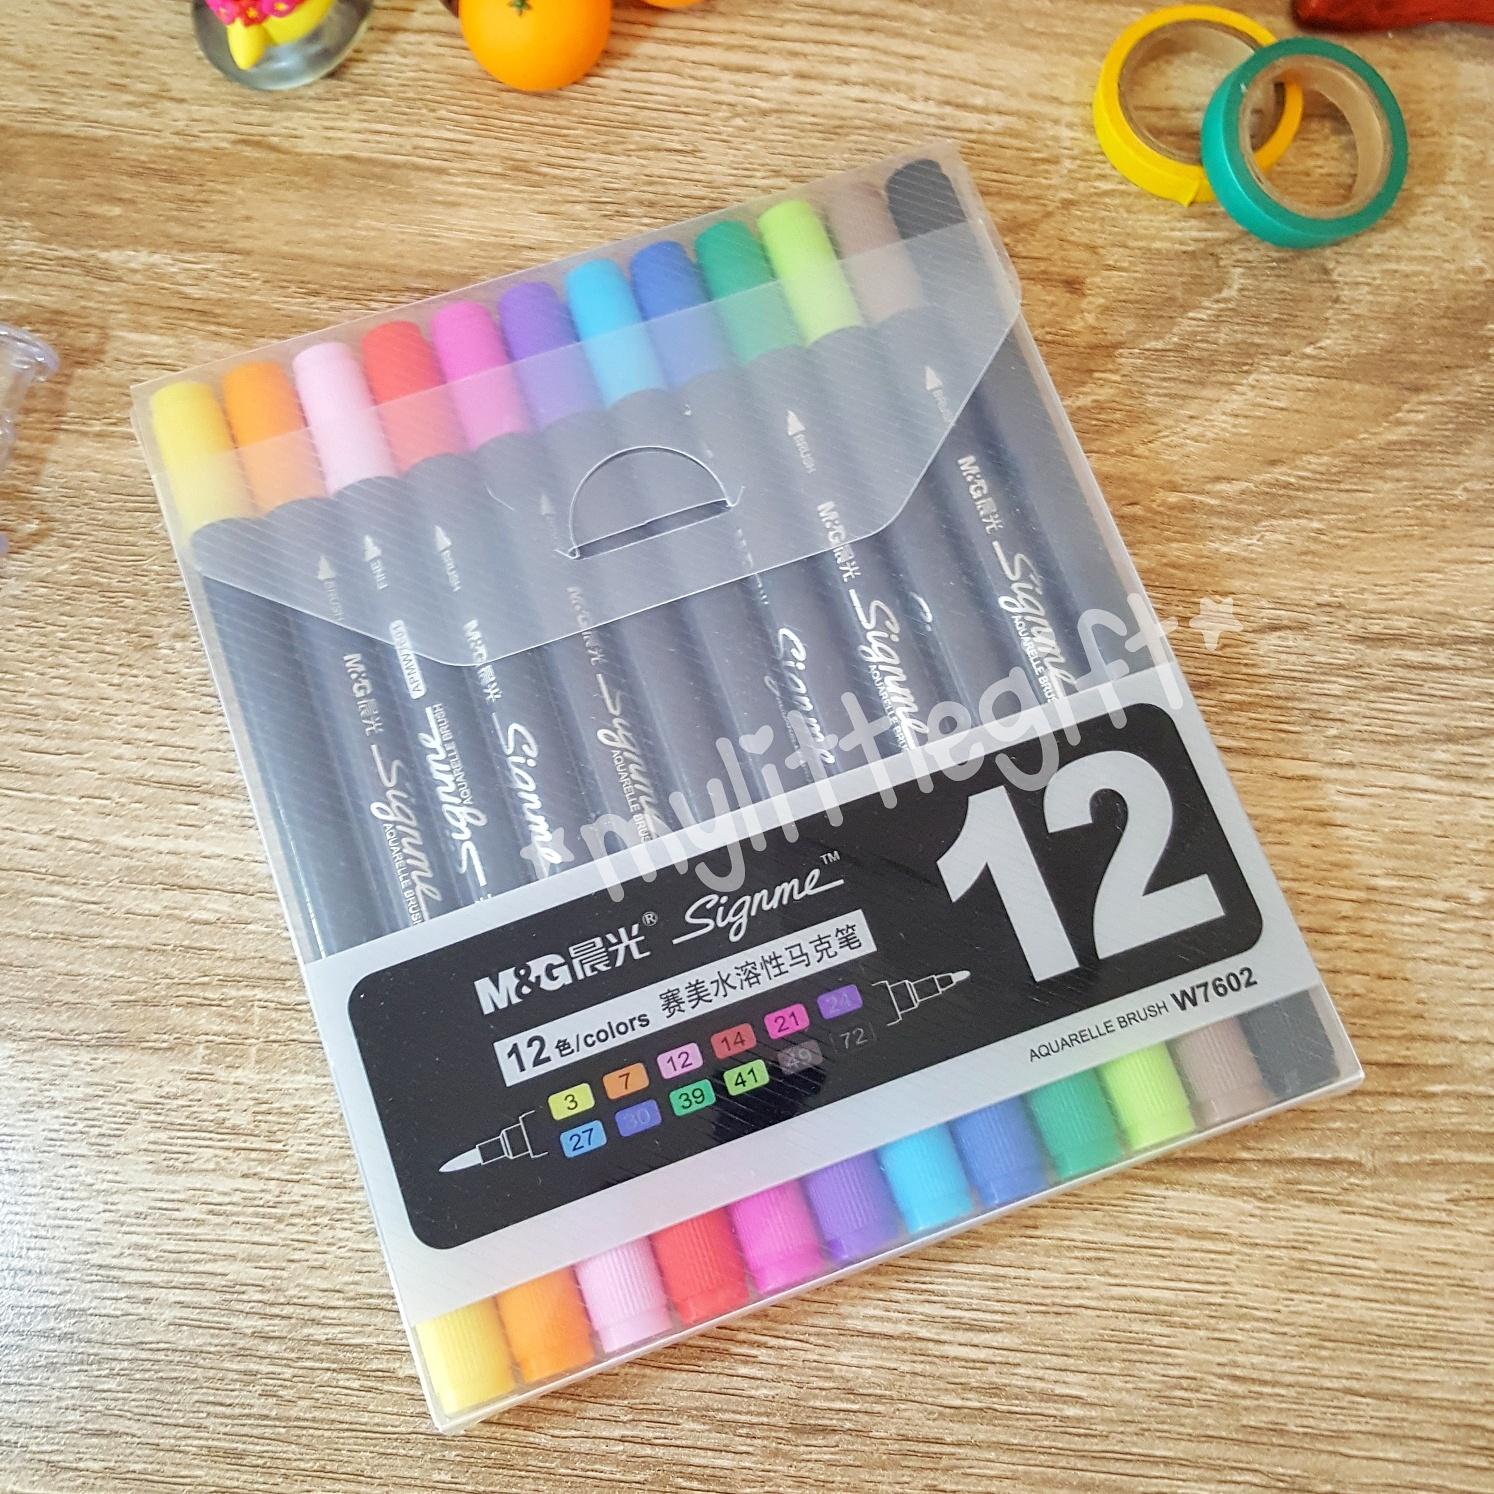 M&G Signme 12 colors Aquarelle Brush